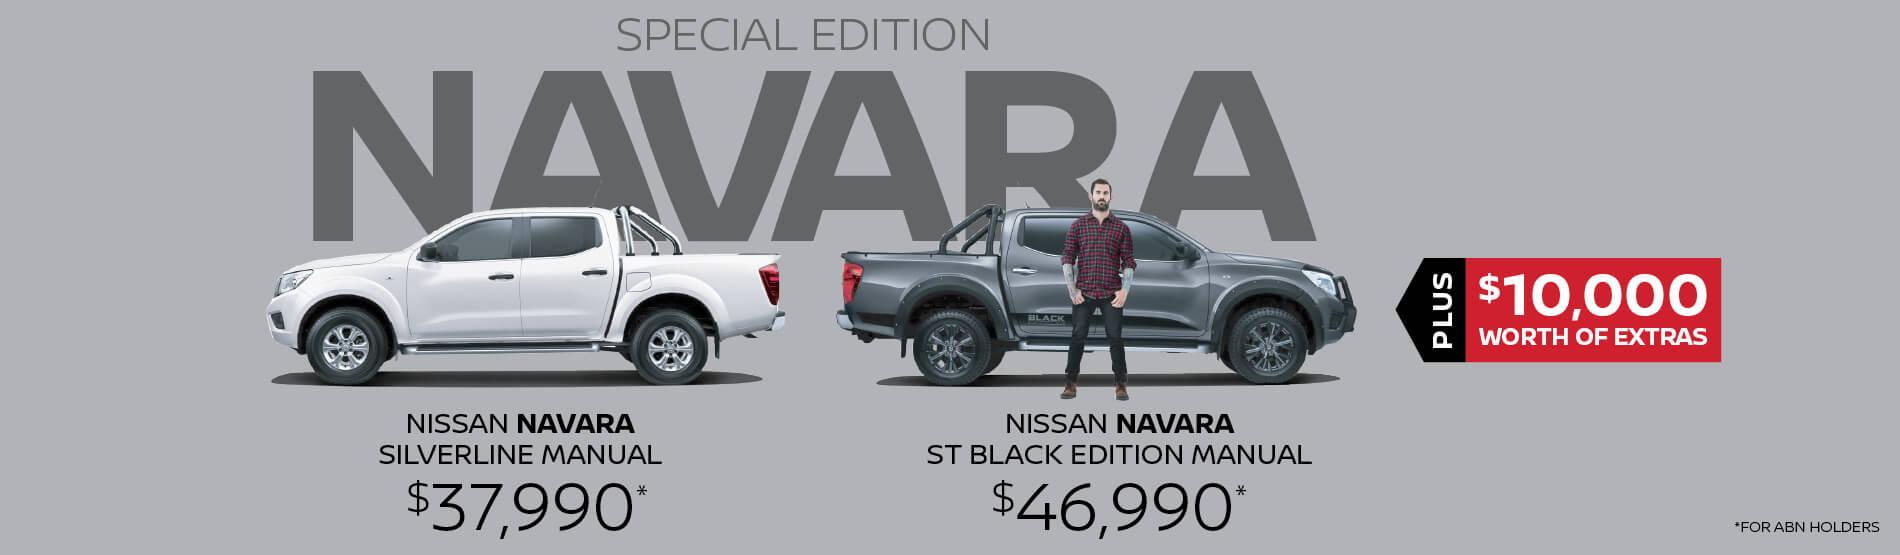 Special Navara - Parry North Queensland Nissan